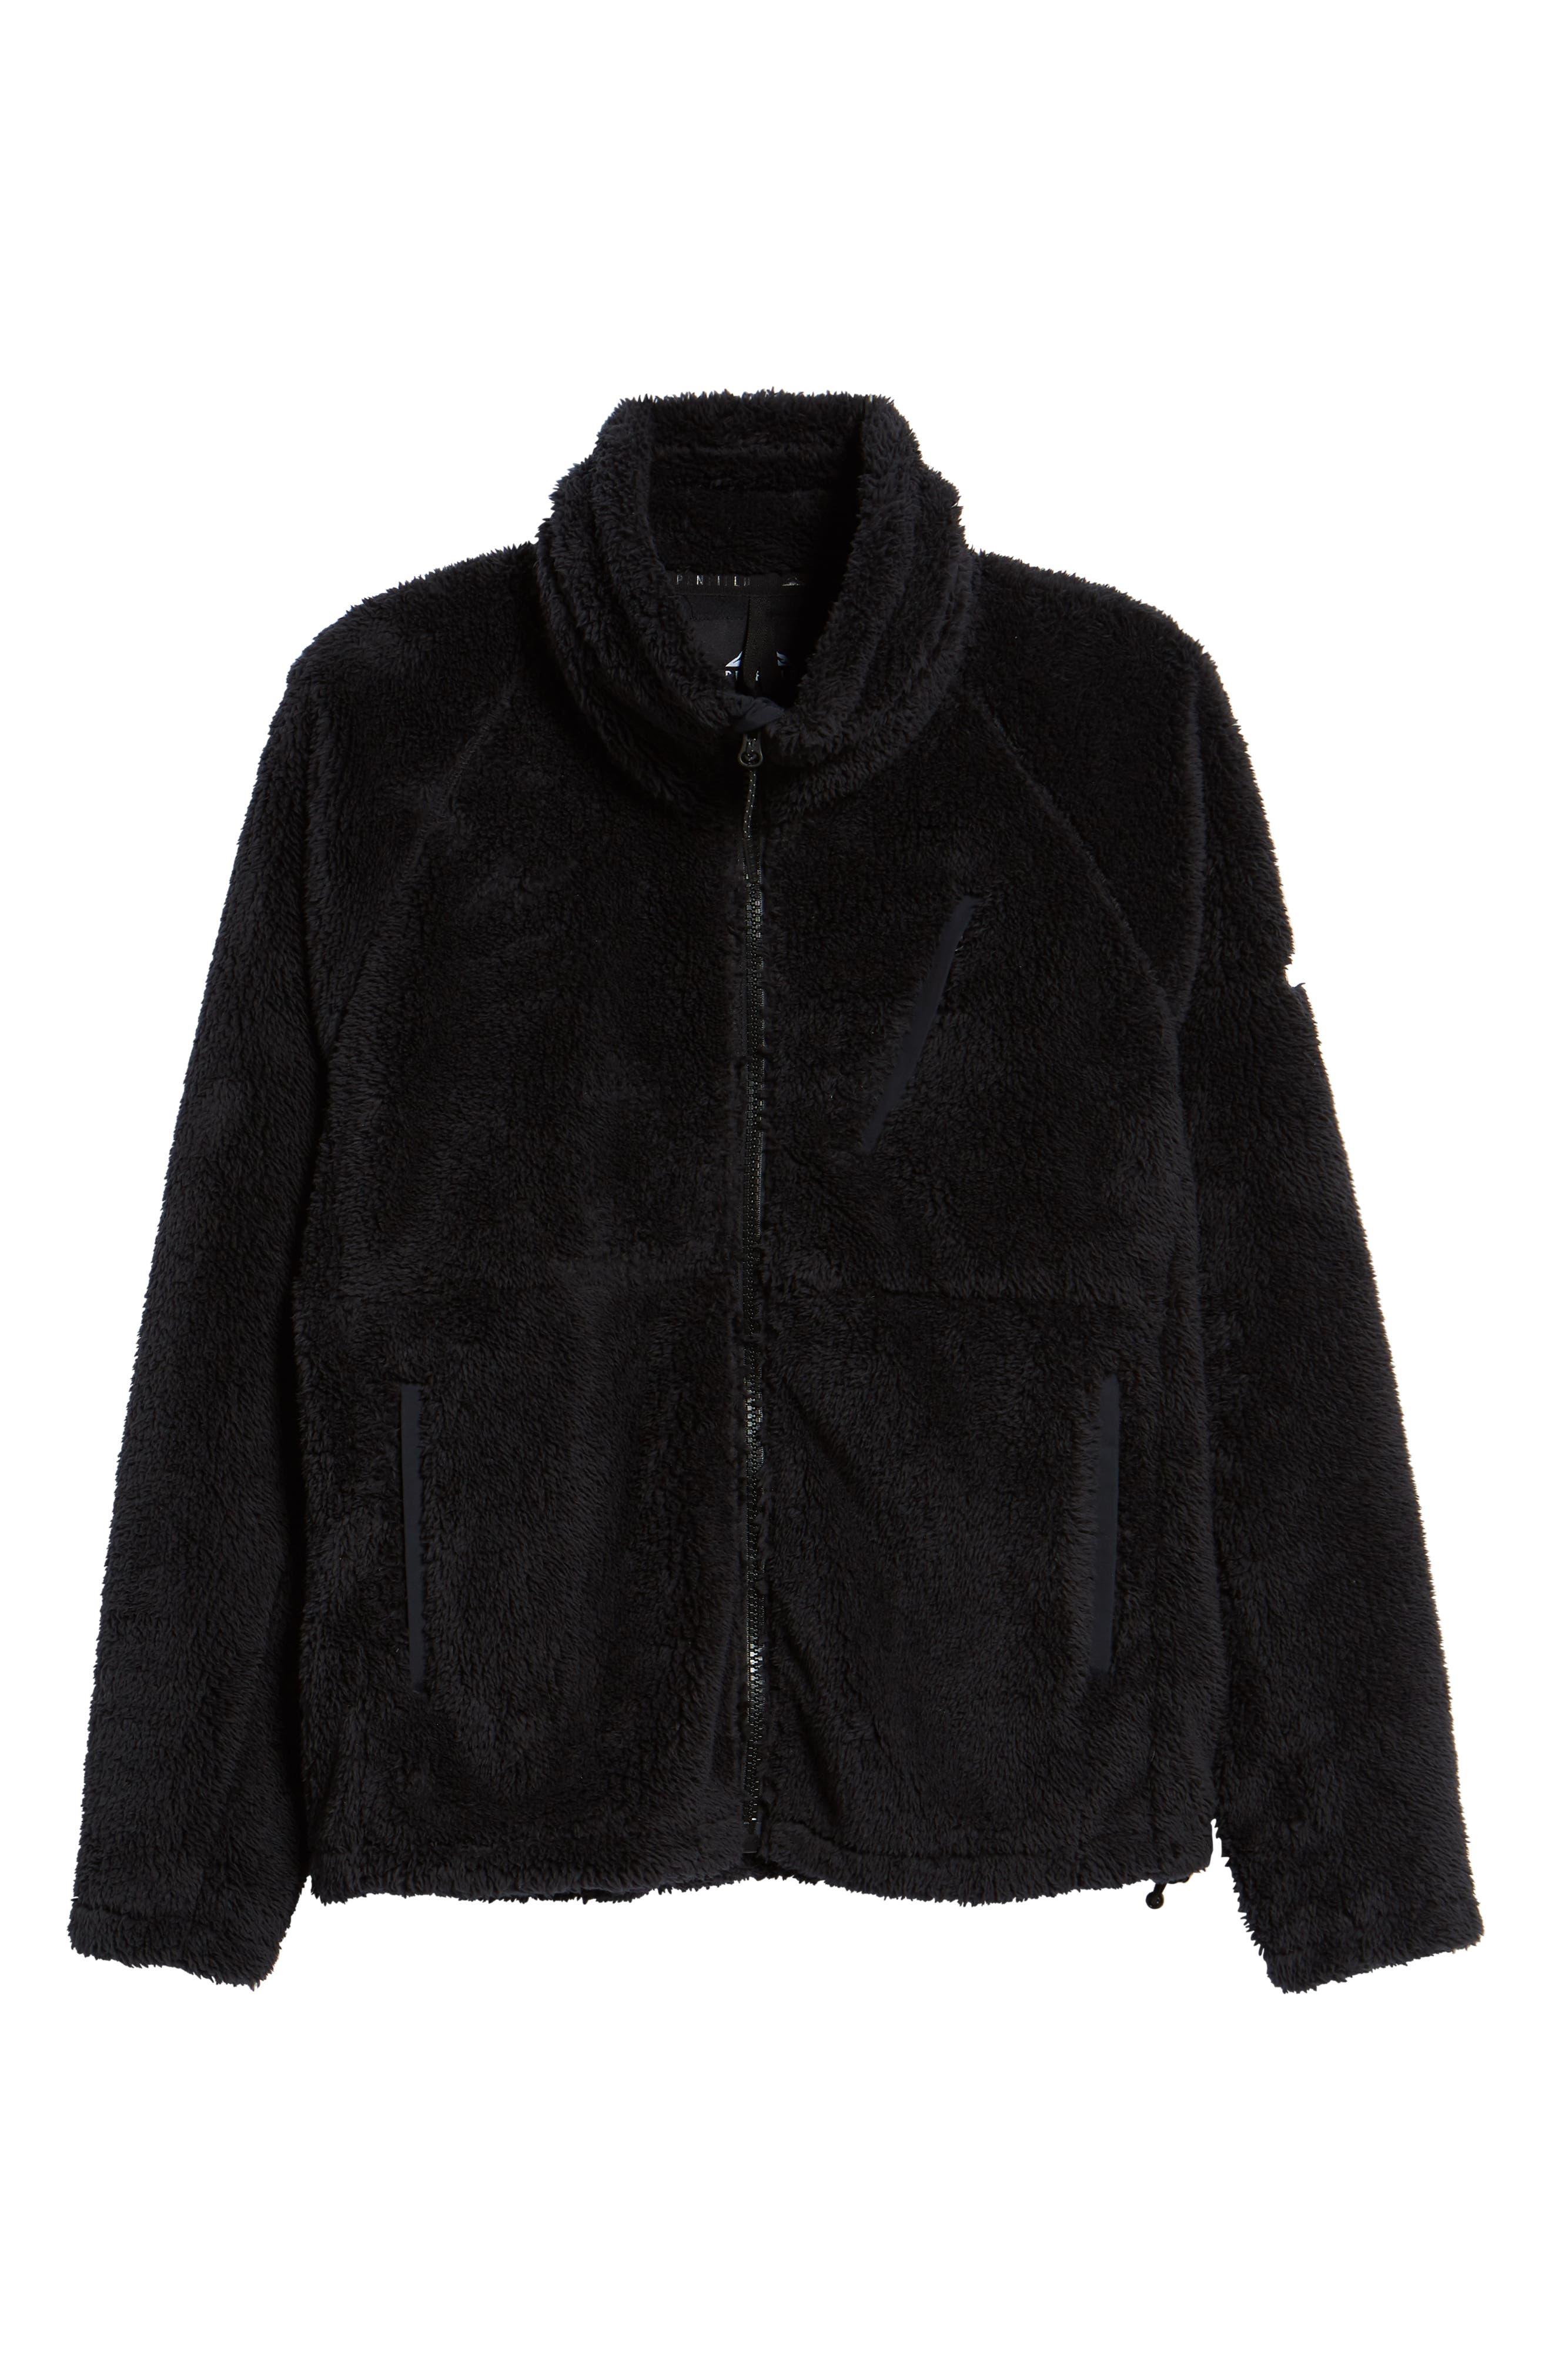 Breakheart Zip Fleece Jacket,                             Alternate thumbnail 6, color,                             001